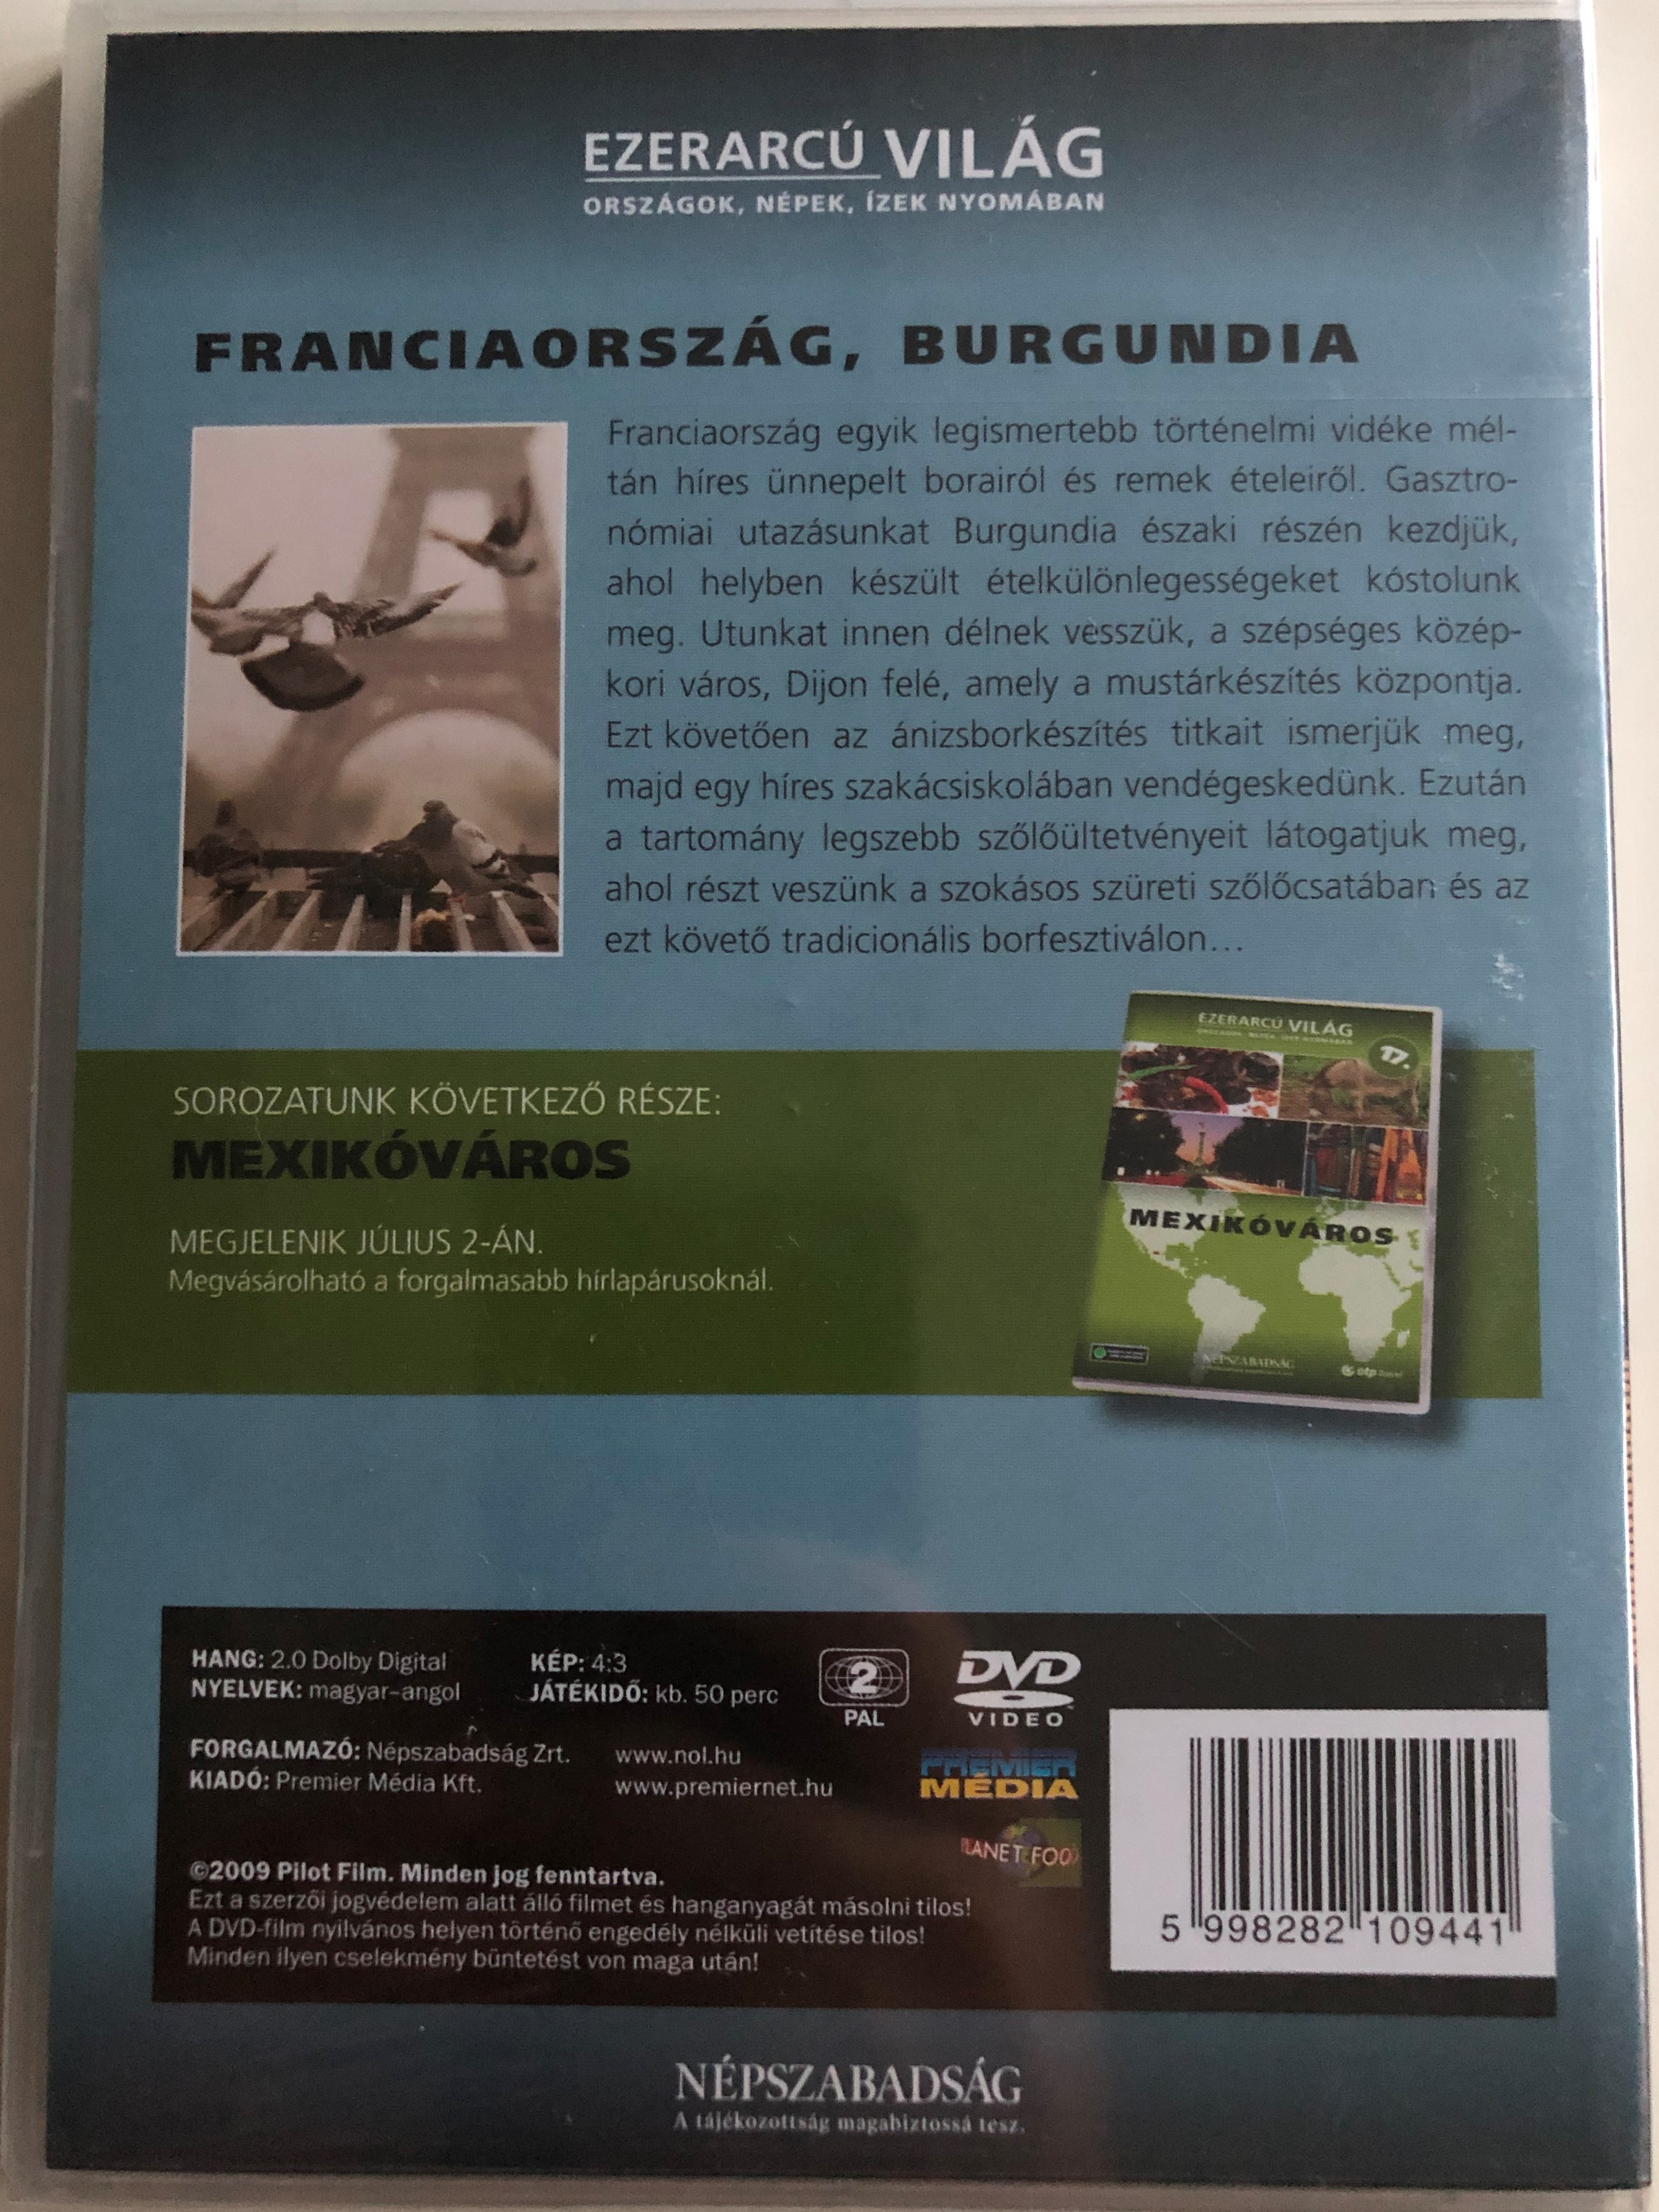 ezerarc-vil-g-vol.-16-franciaorsz-g-burgundia-france-burgundy-dvd-2009-orsz-gok-n-pek-zek-nyom-ban-20-x-dvd-set-2009-n-pszabads-g-premier-media-pilot-film-documentary-series-about-our-world-2-.jpg